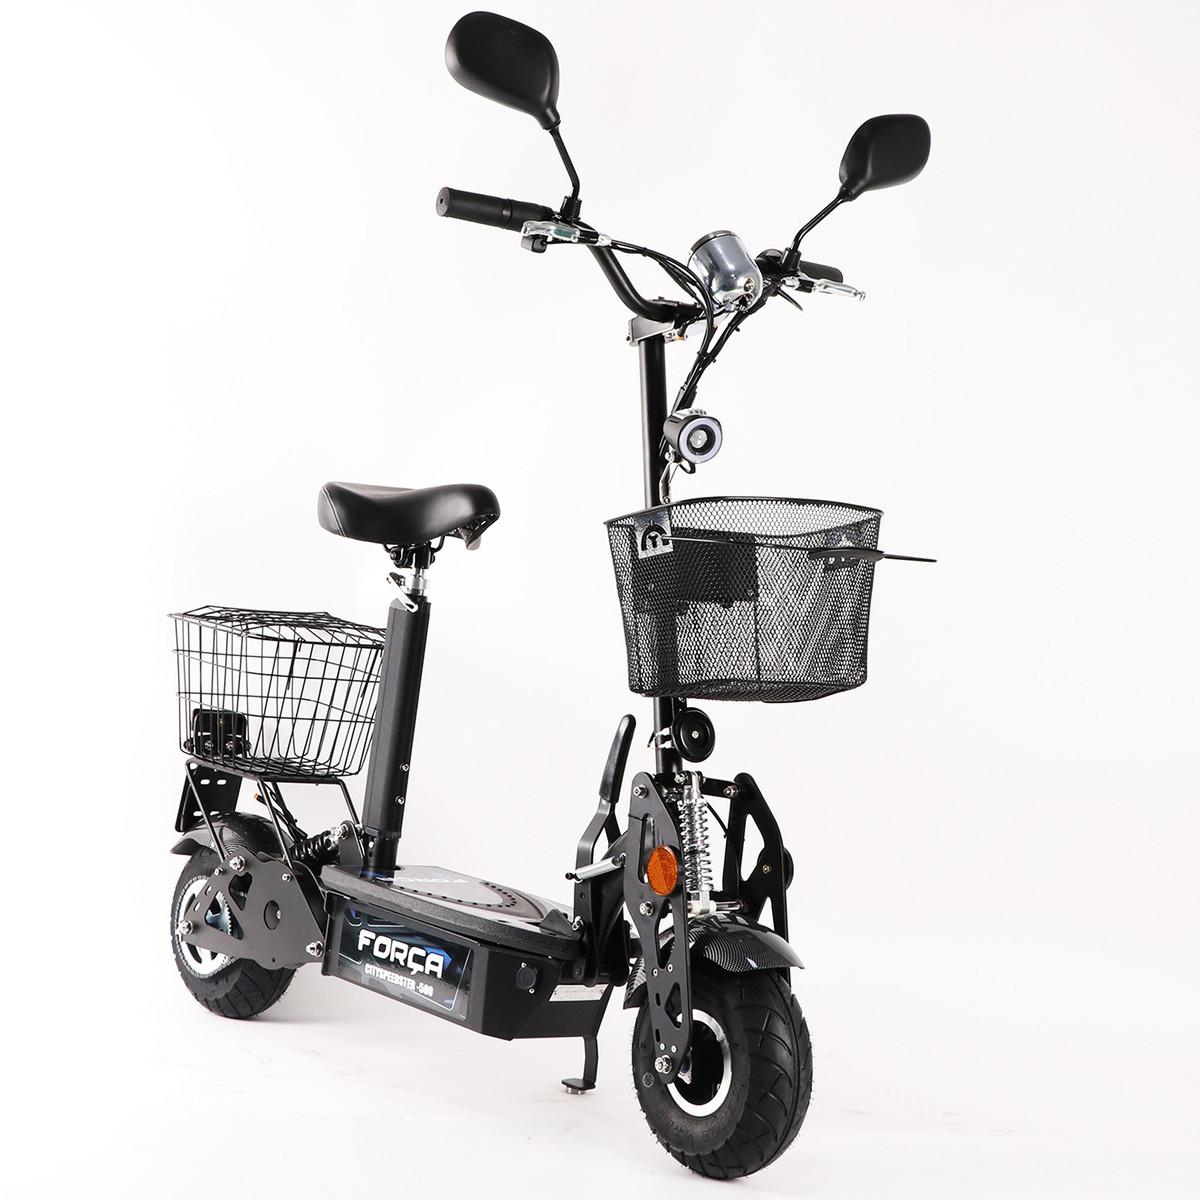 FORÇA CITYSPEEDSTER III 500 20 KM/H ElektroScooter mit Strassenzulassung SCHWARZ